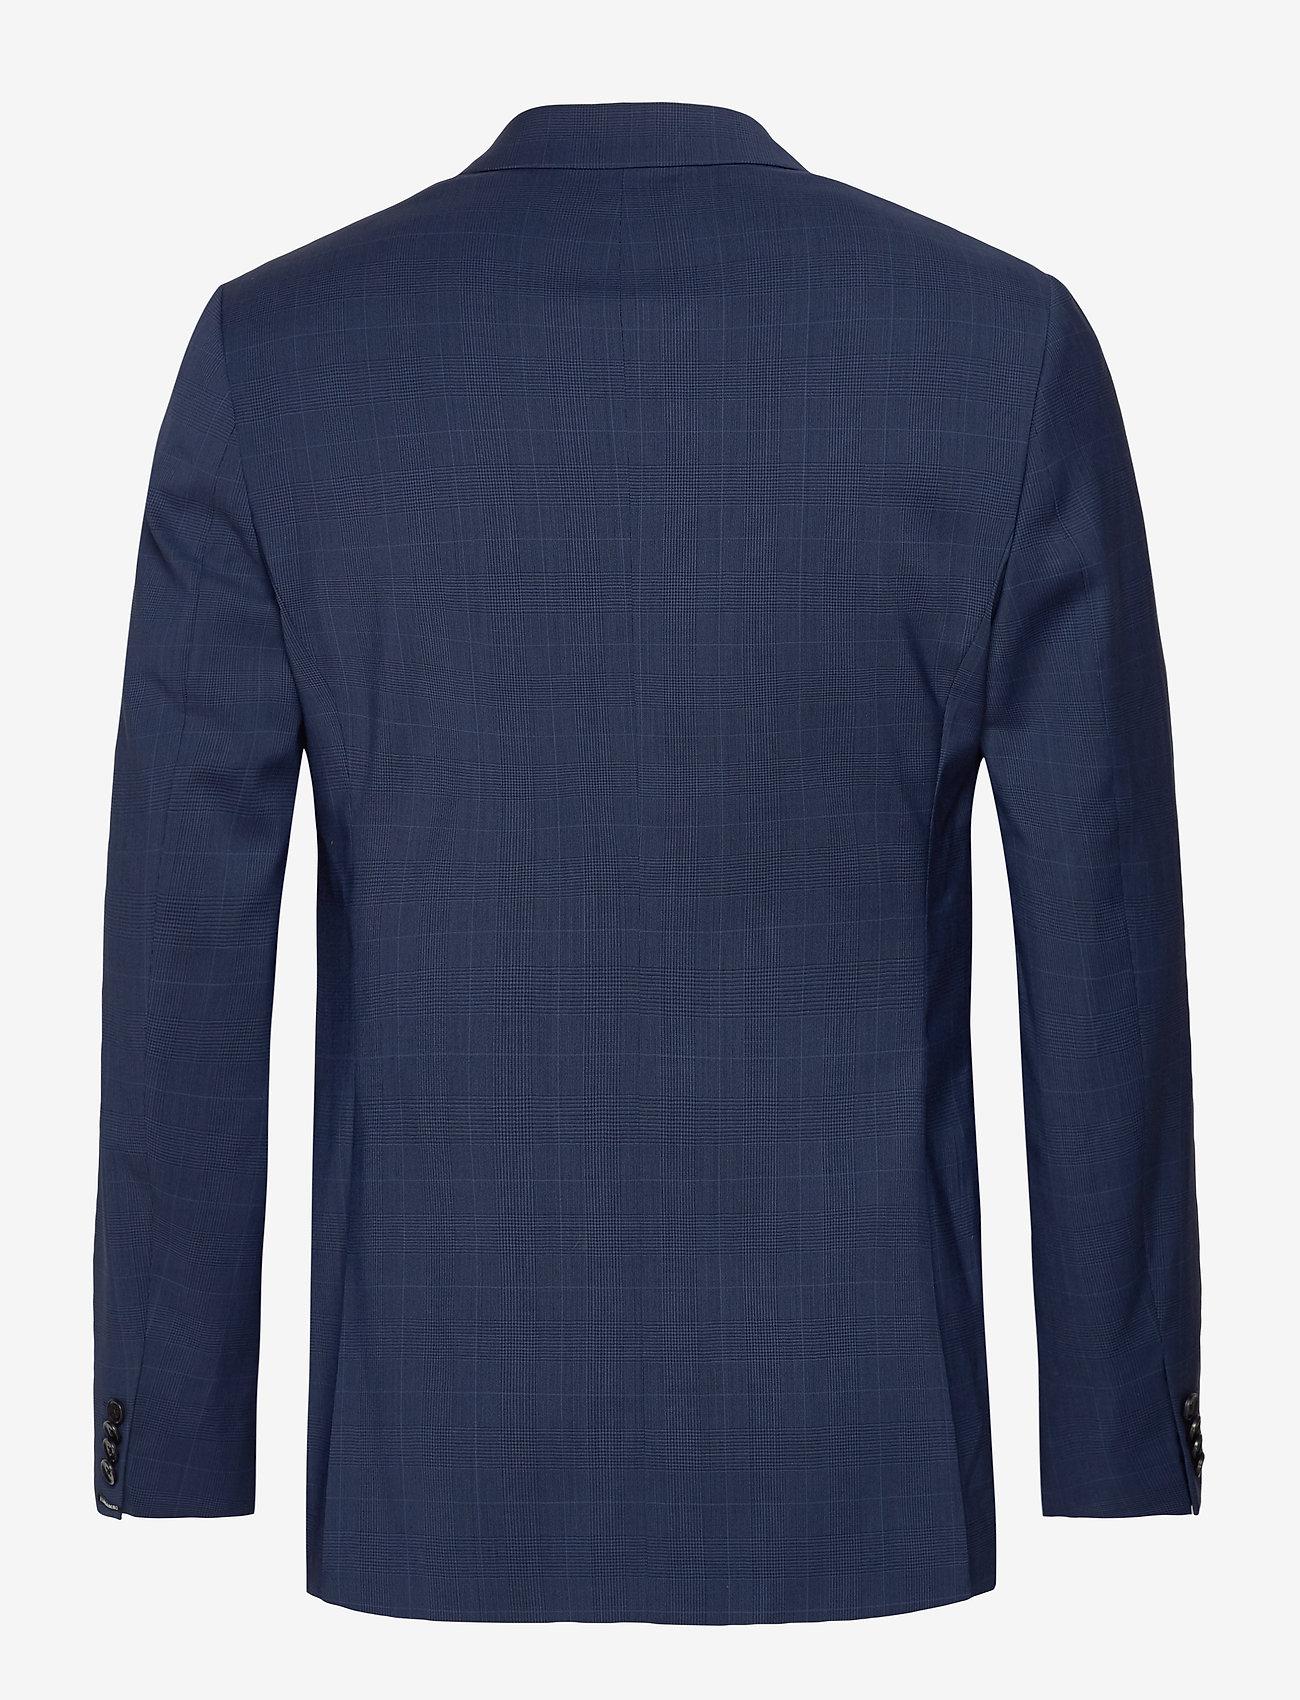 J. Lindeberg - Ben Soft-Voyager Wool - single breasted blazers - mid blue - 1